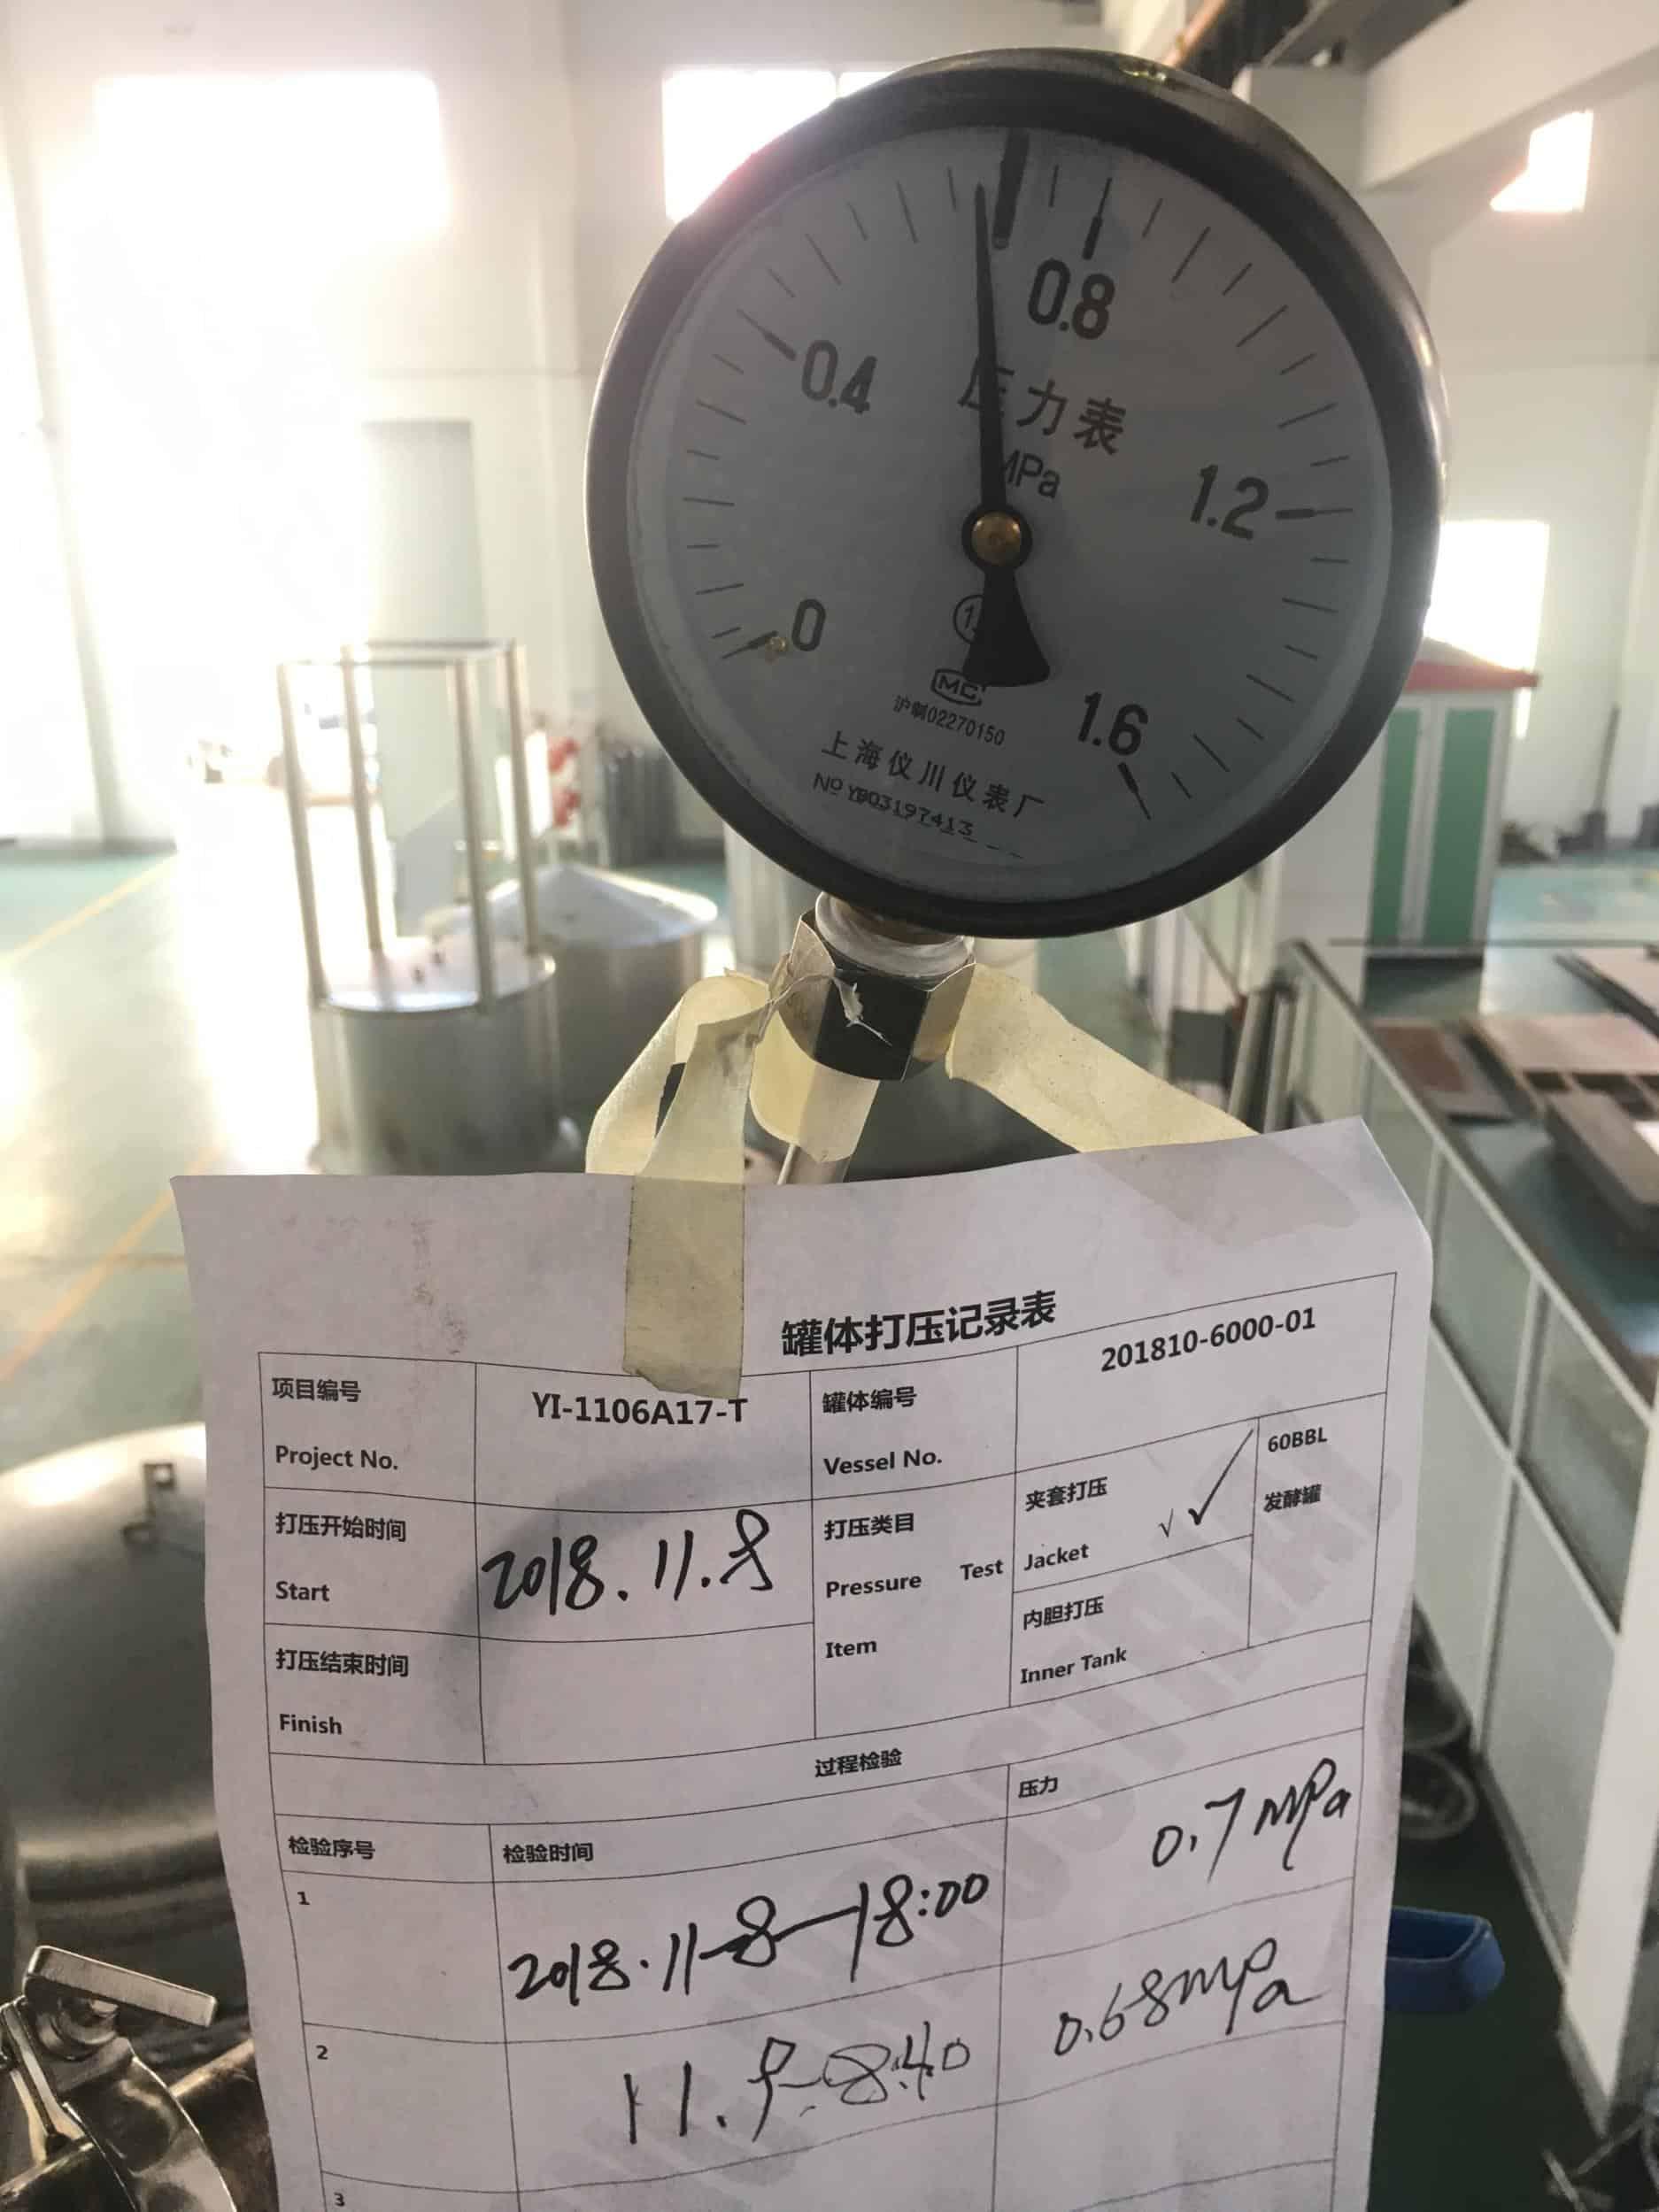 Jacket Pressure Test